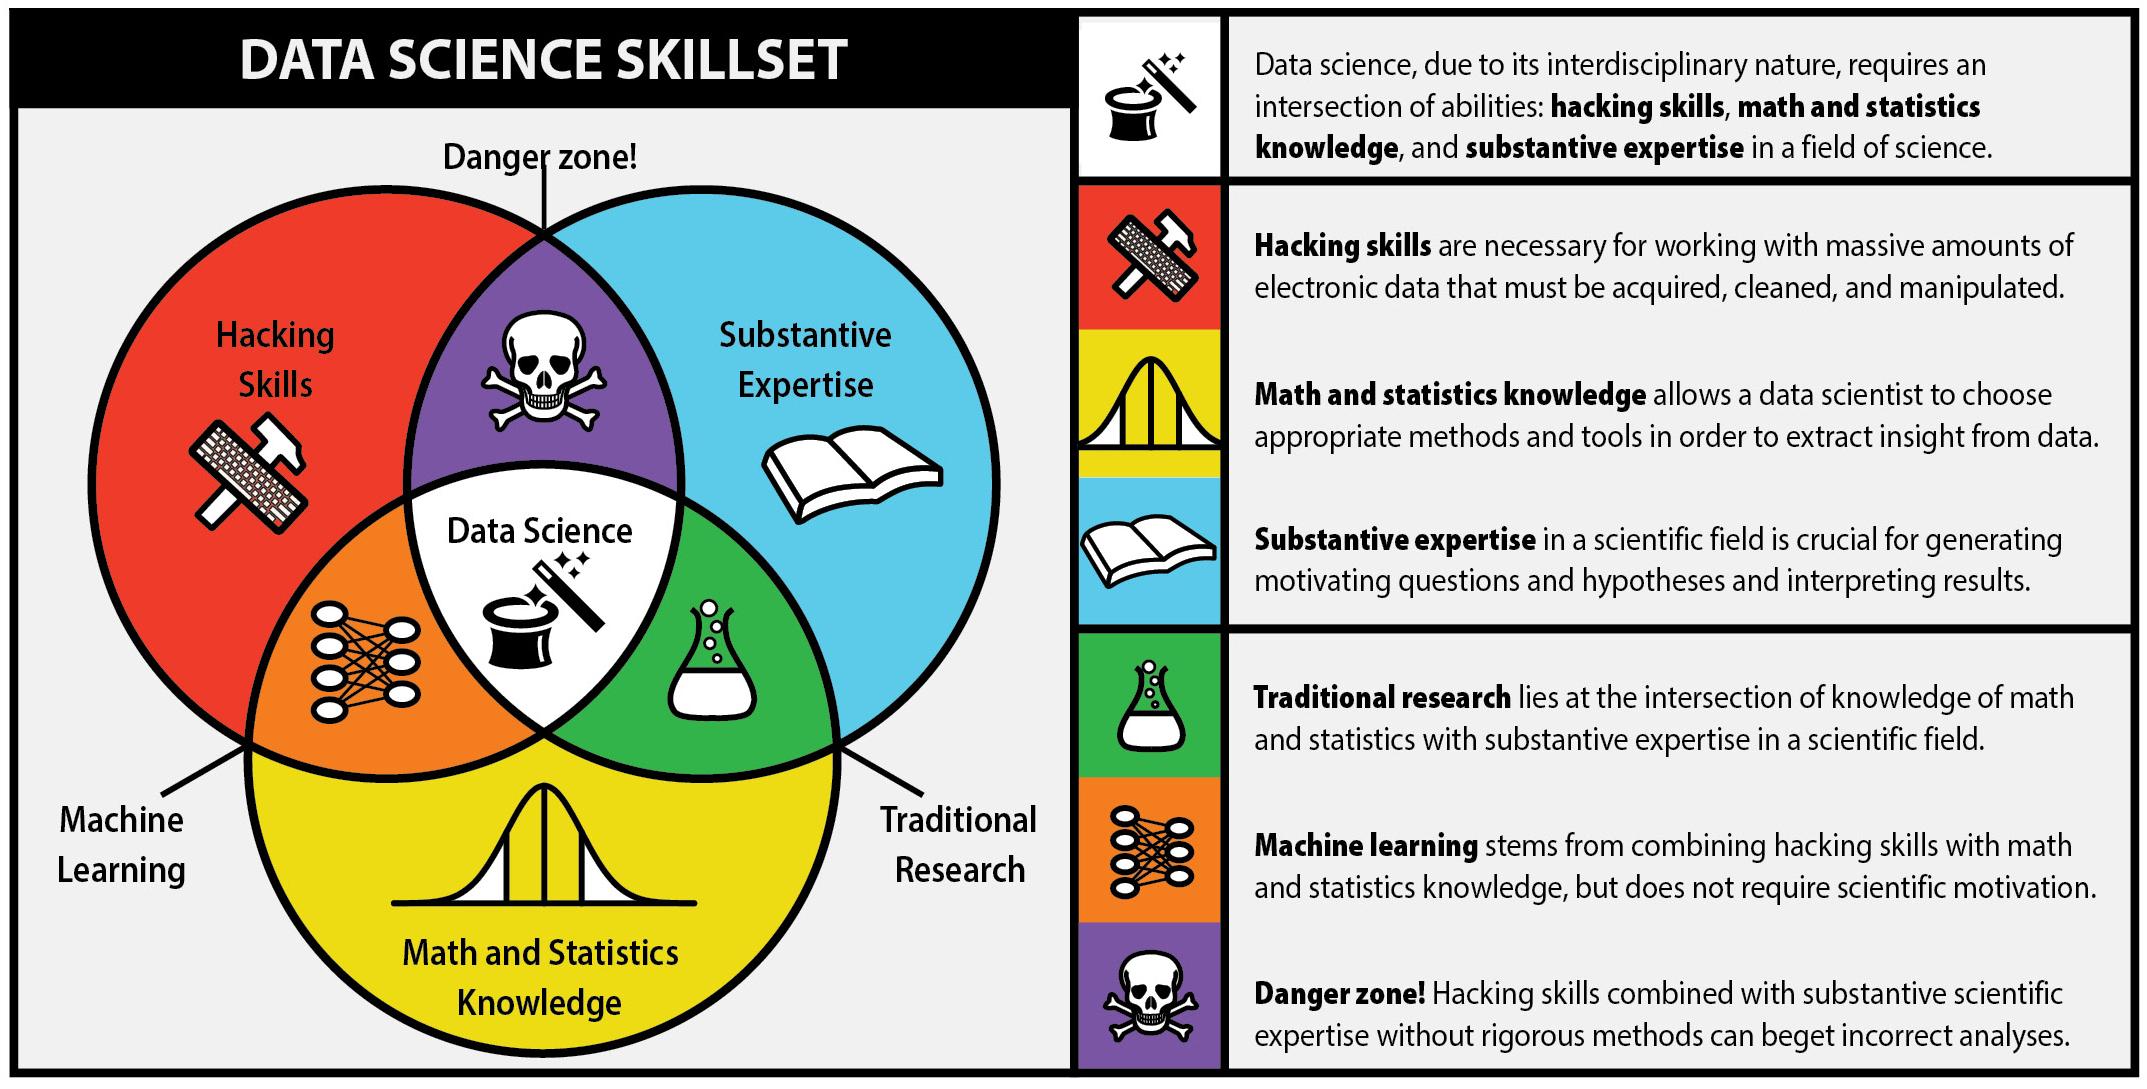 Data science skills